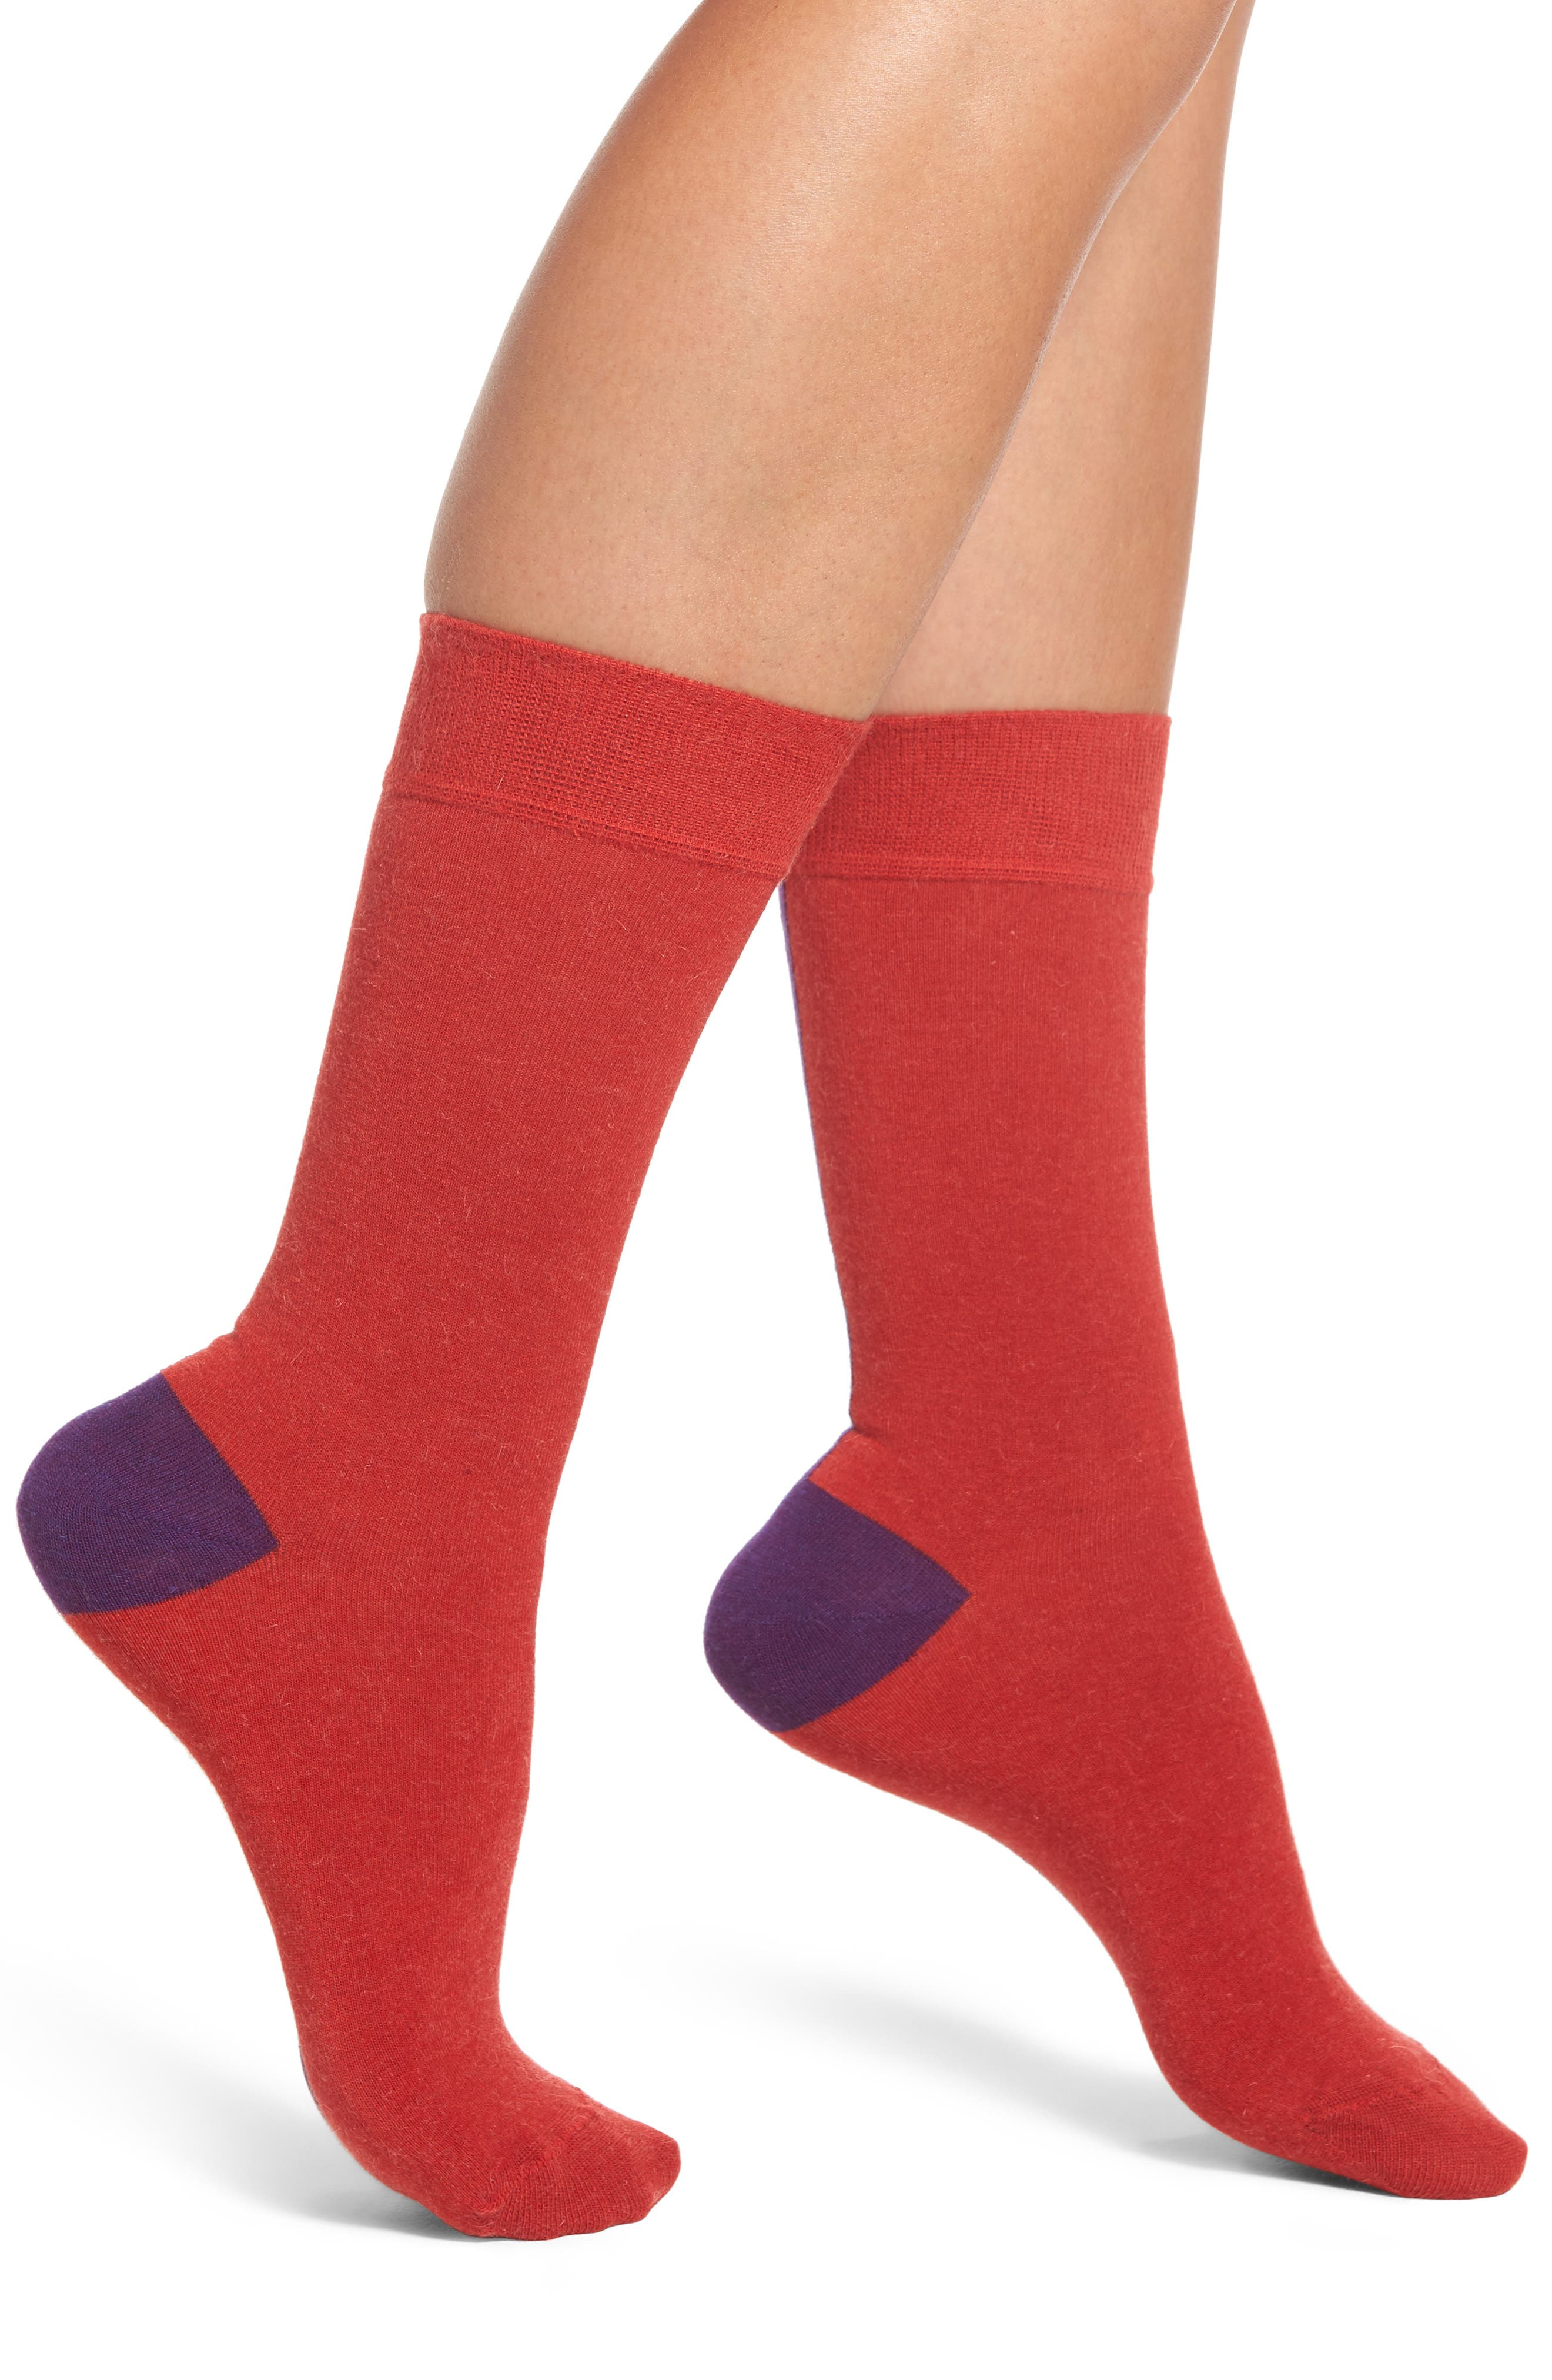 Hysteria by Happy Socks Gigi Crew Socks